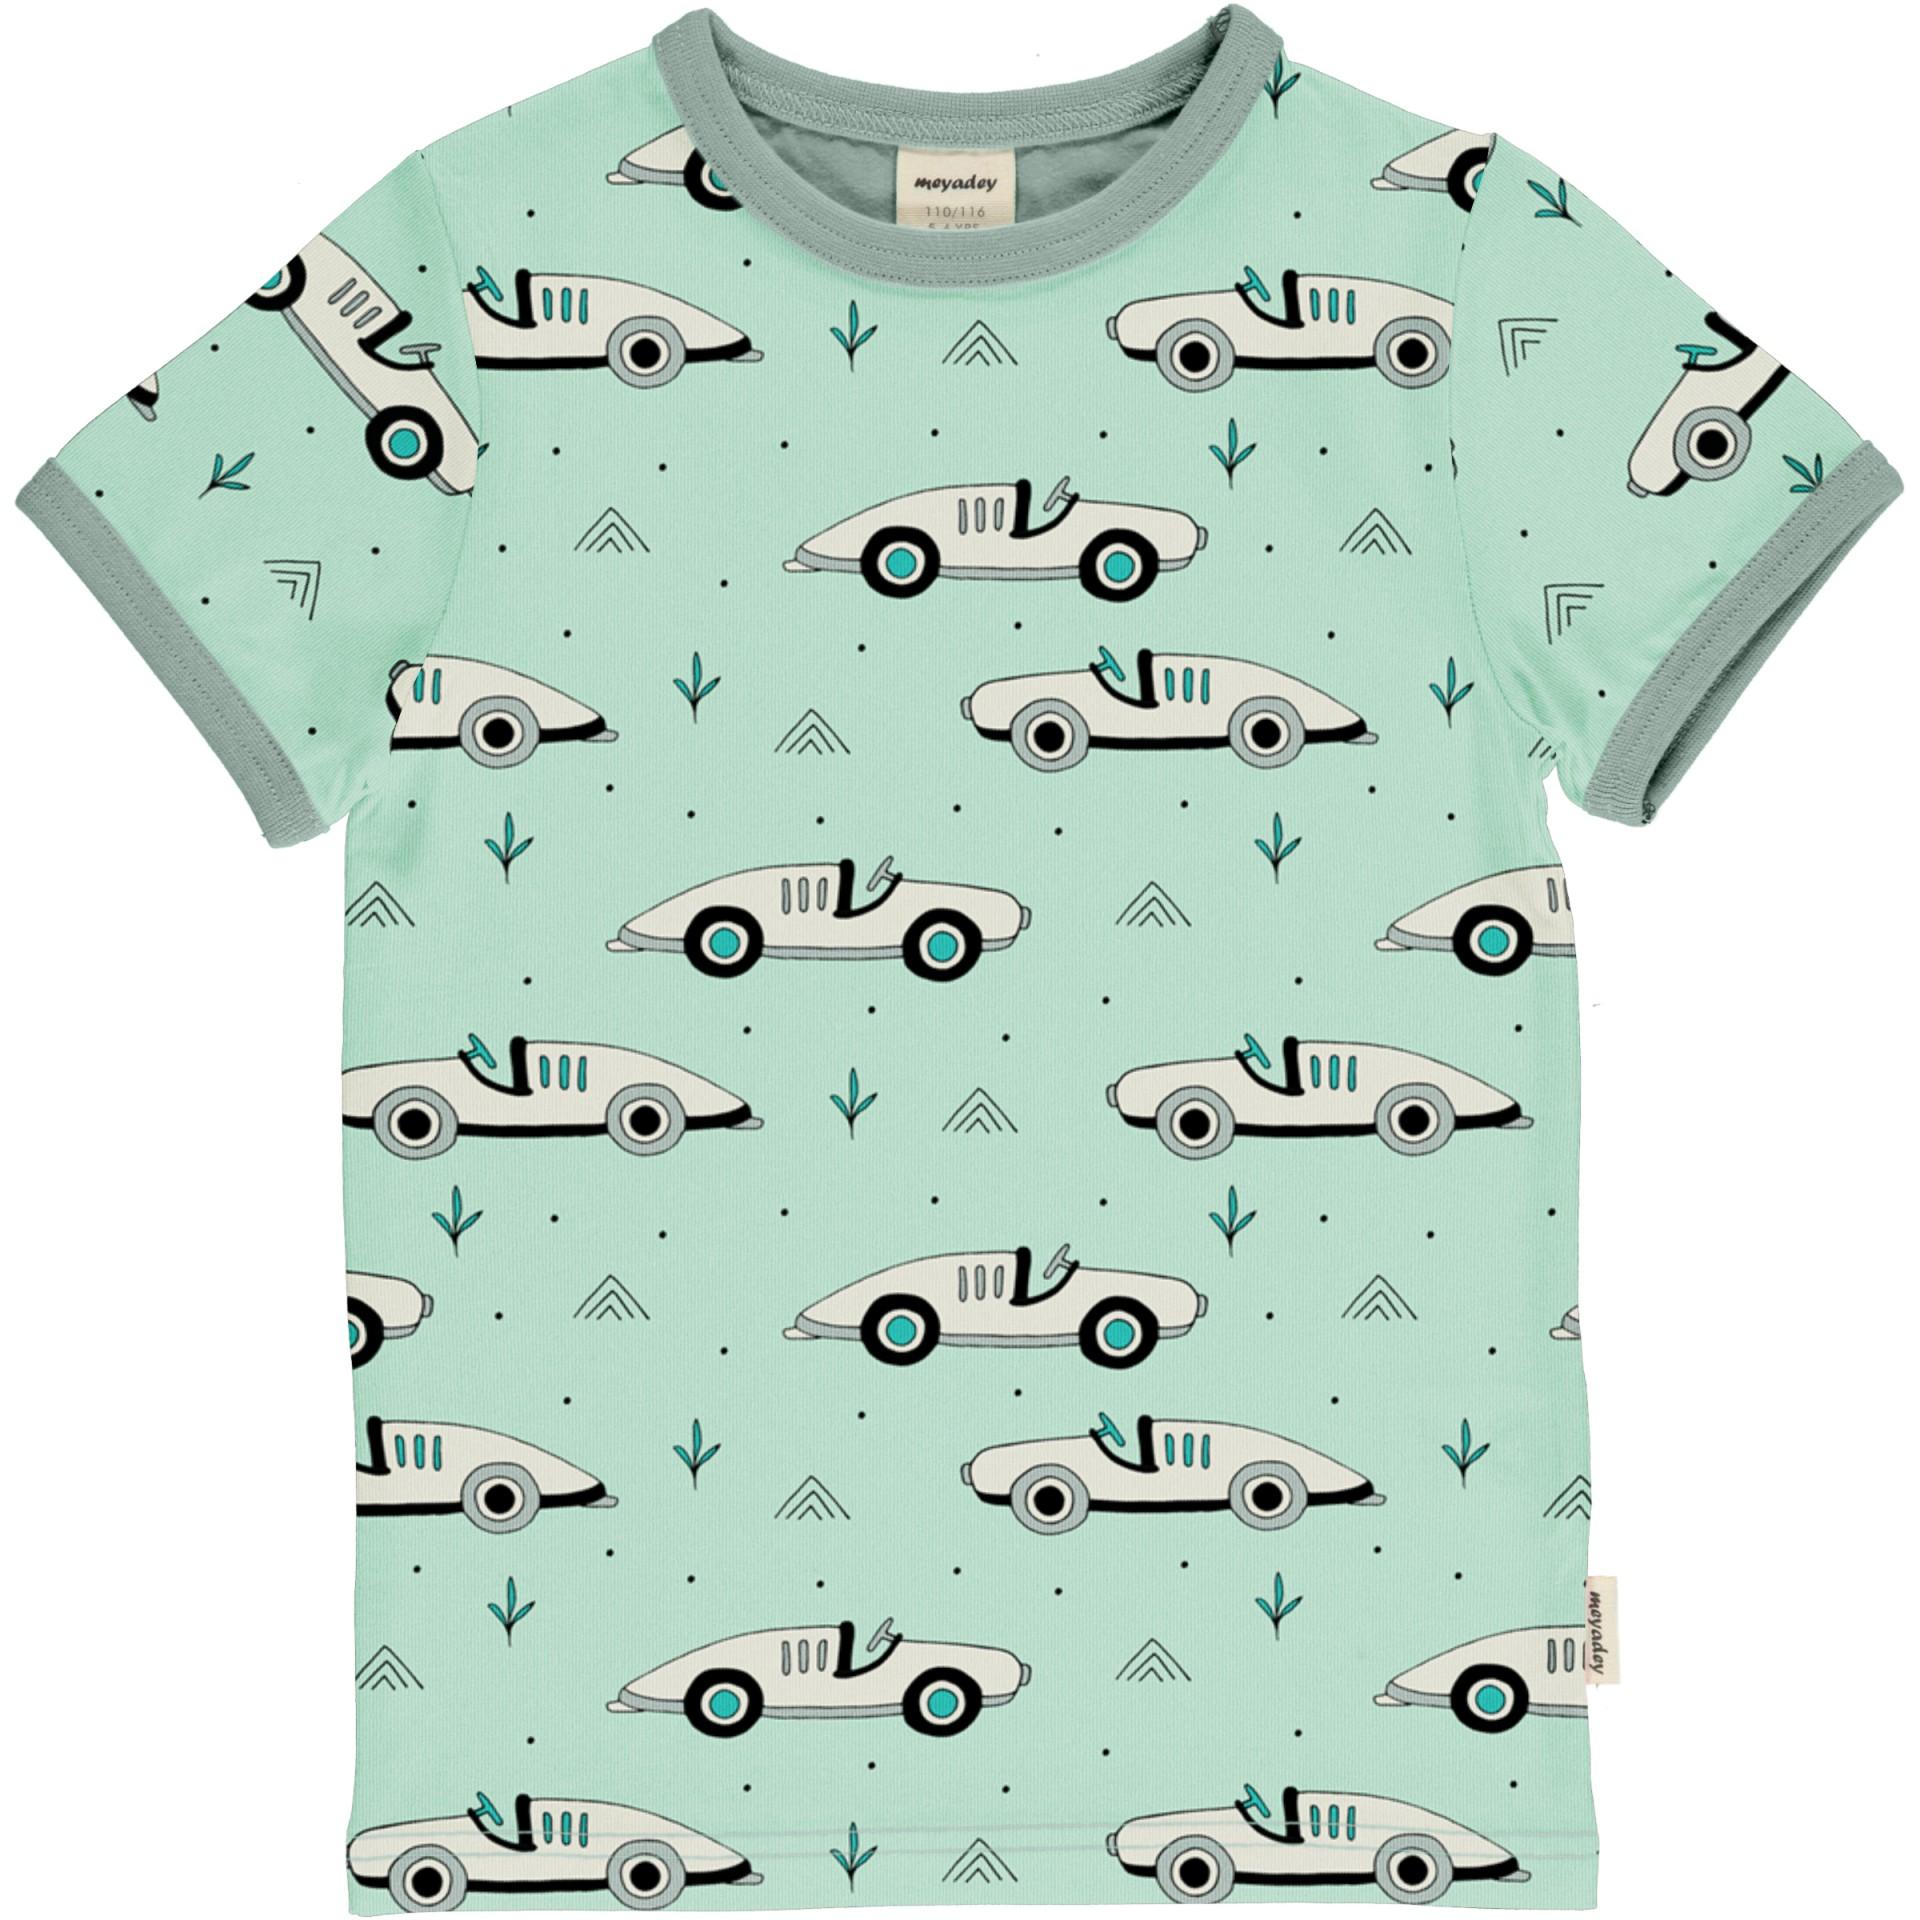 T-shirt Race Cars Meyaday (Tamanhos disponíveis 9-12m, 18-24m)